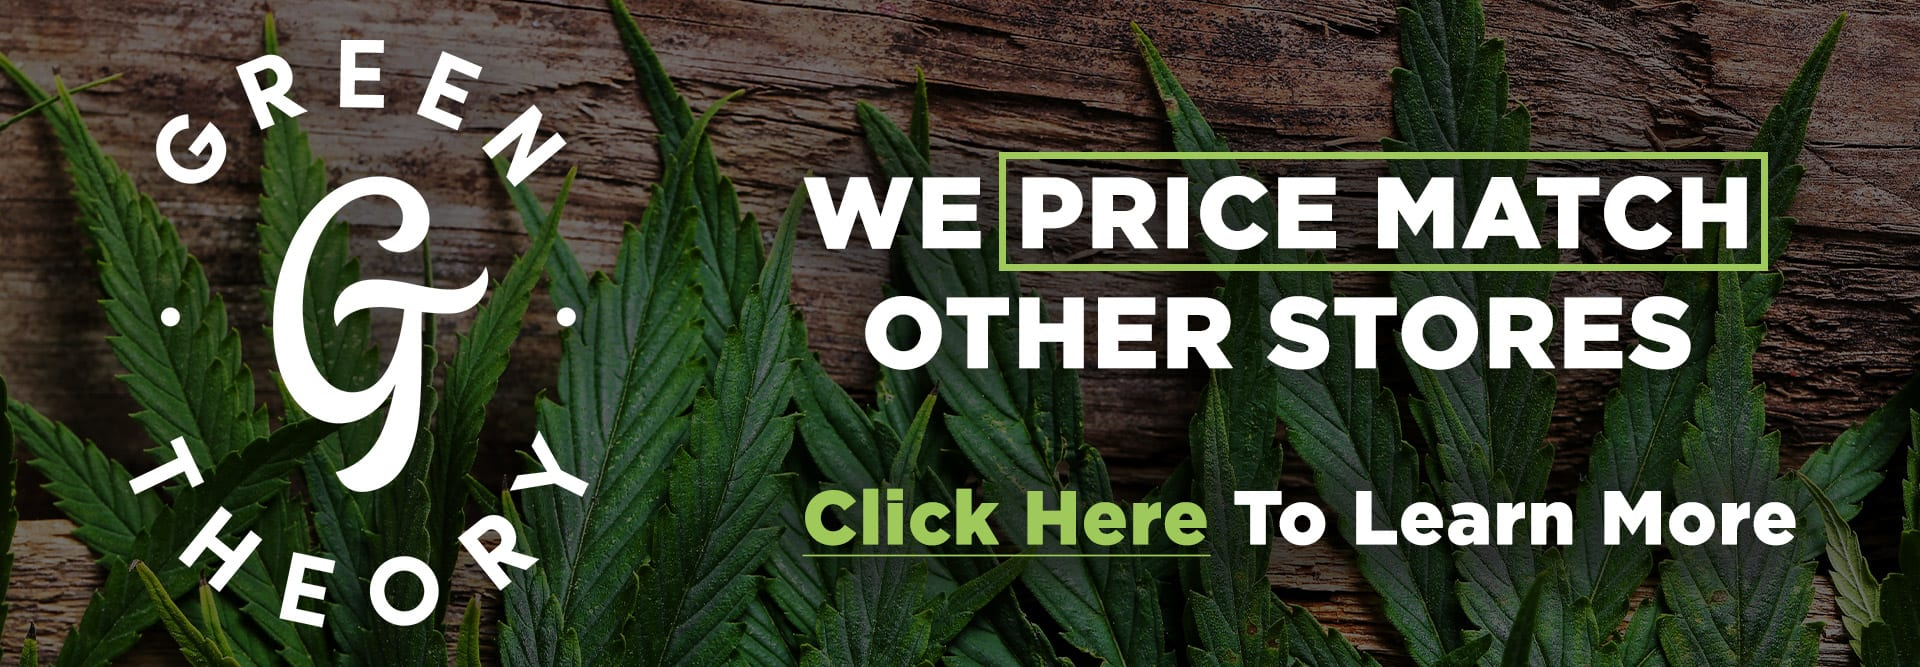 Price-Match-Slide